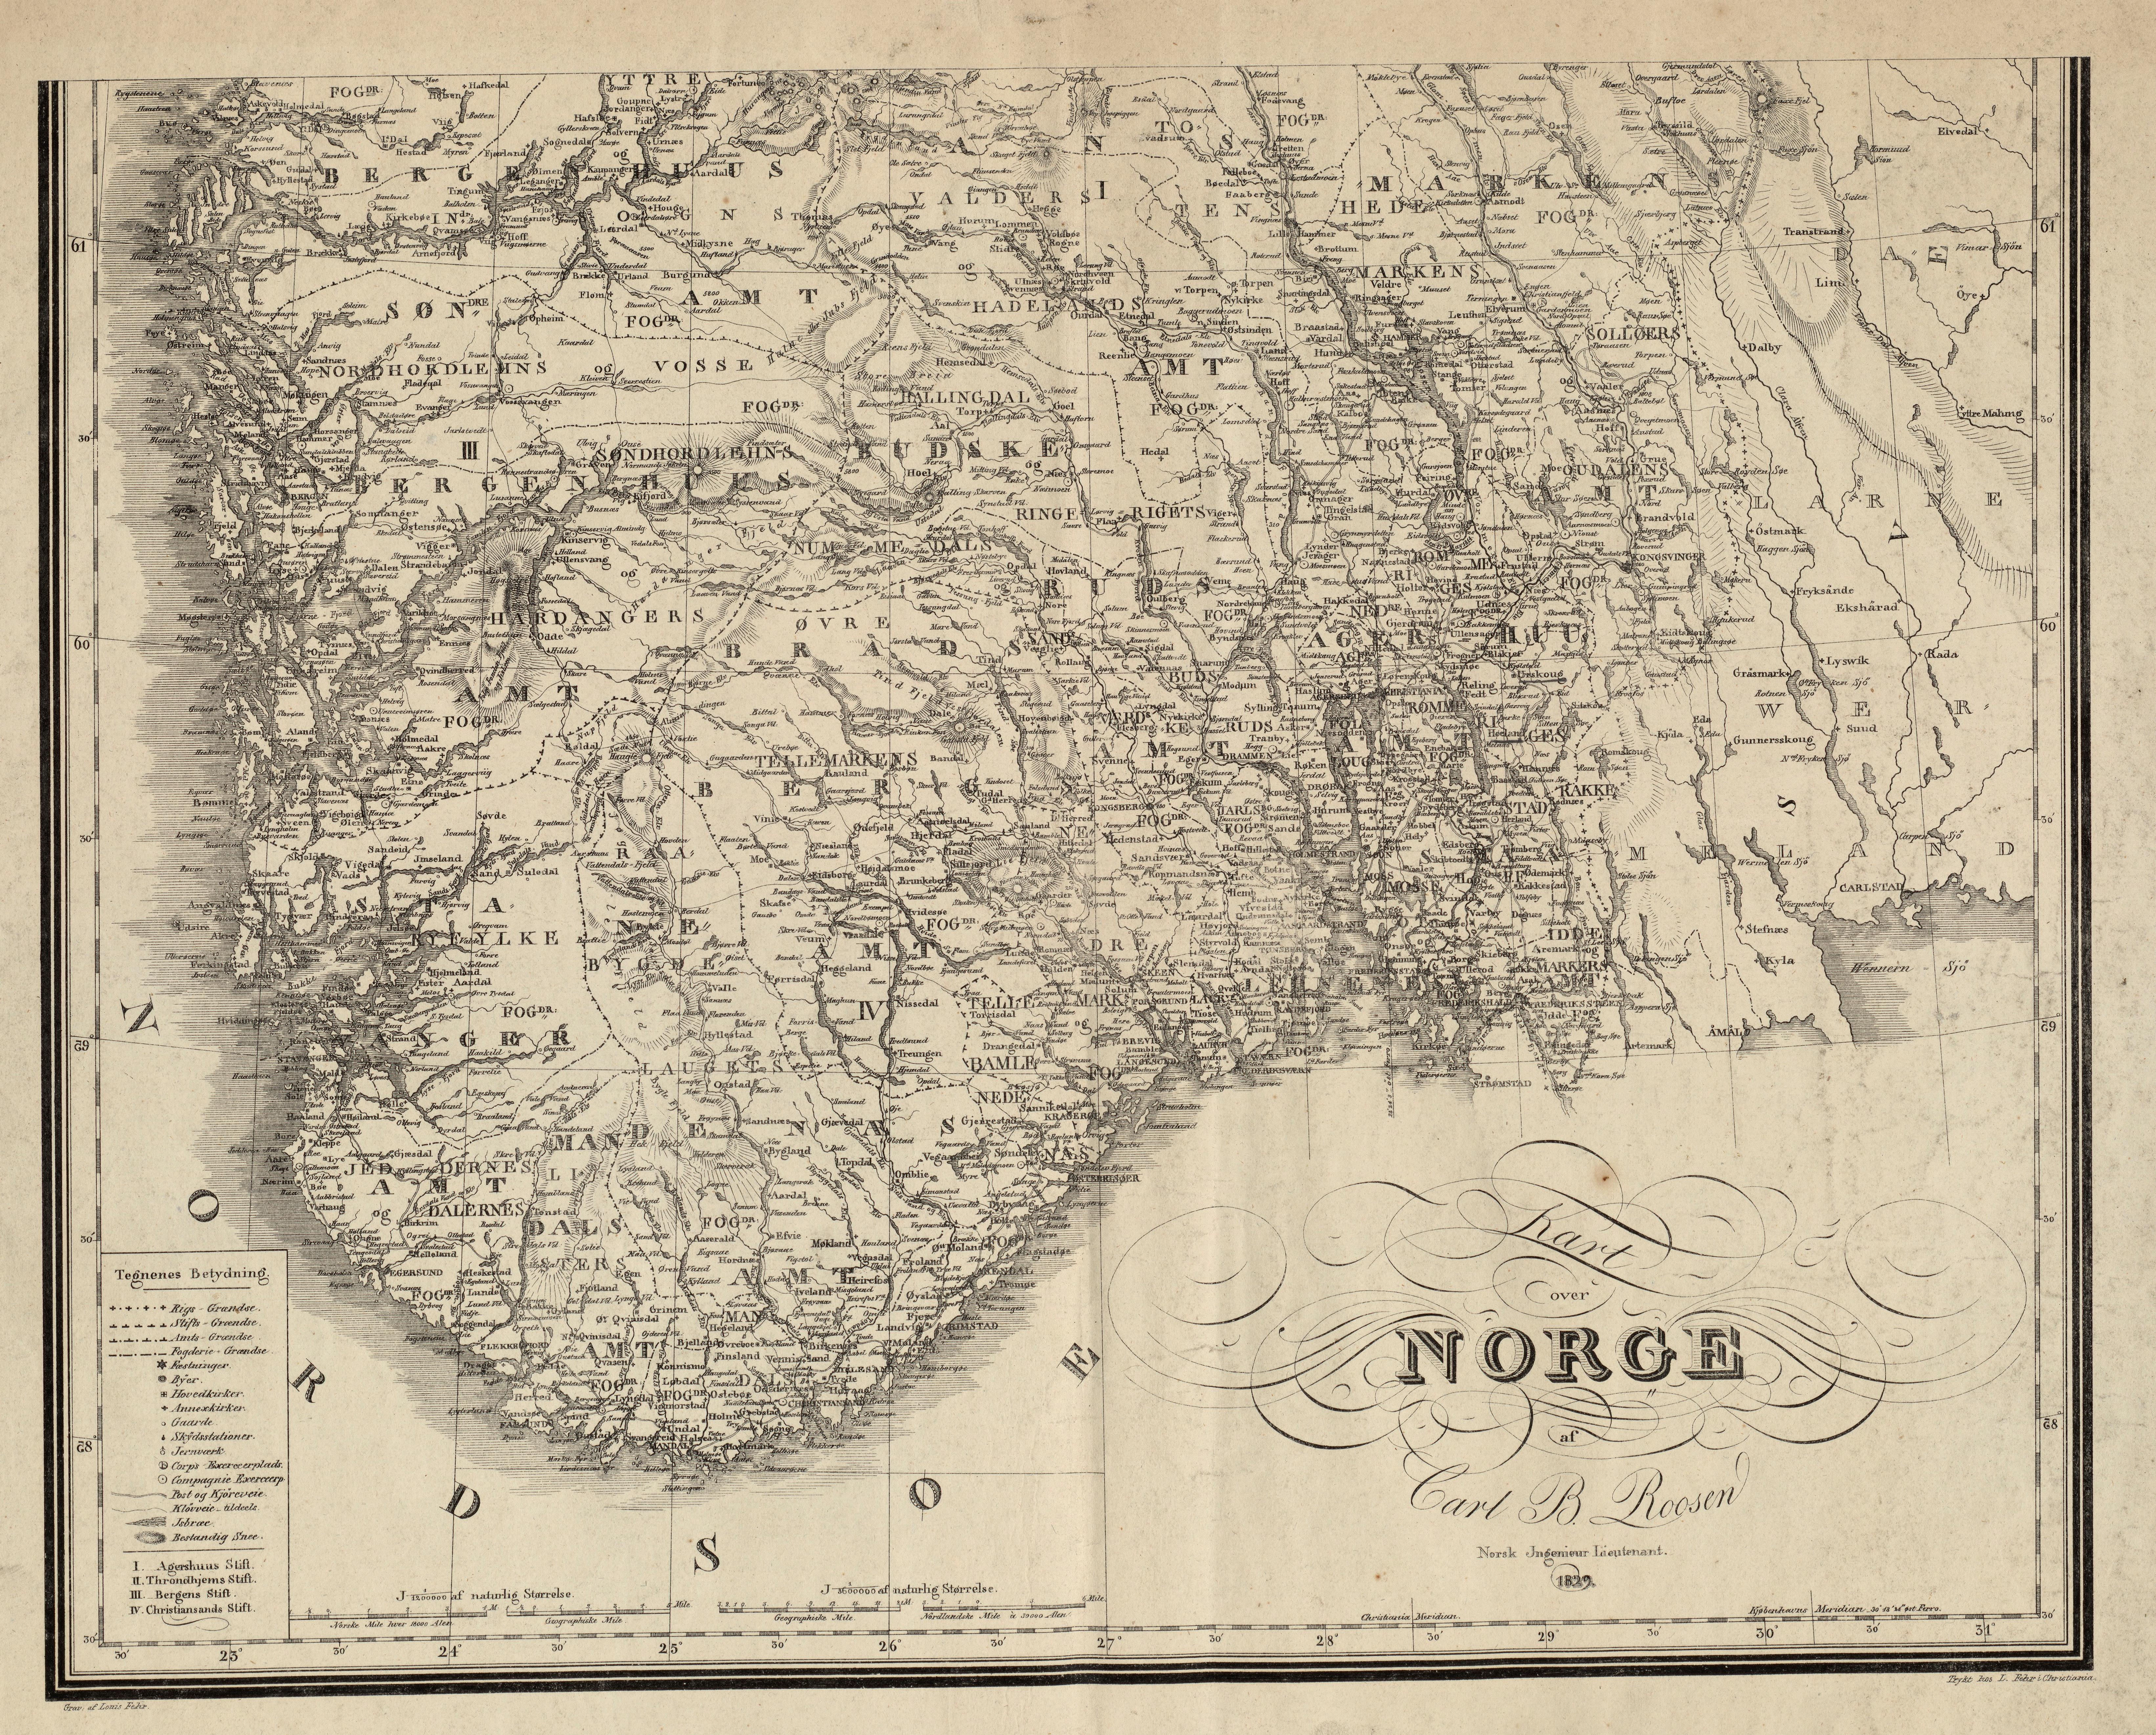 kart over norge no File:Kart over Norge   no nb krt 00687.   Wikimedia Commons kart over norge no